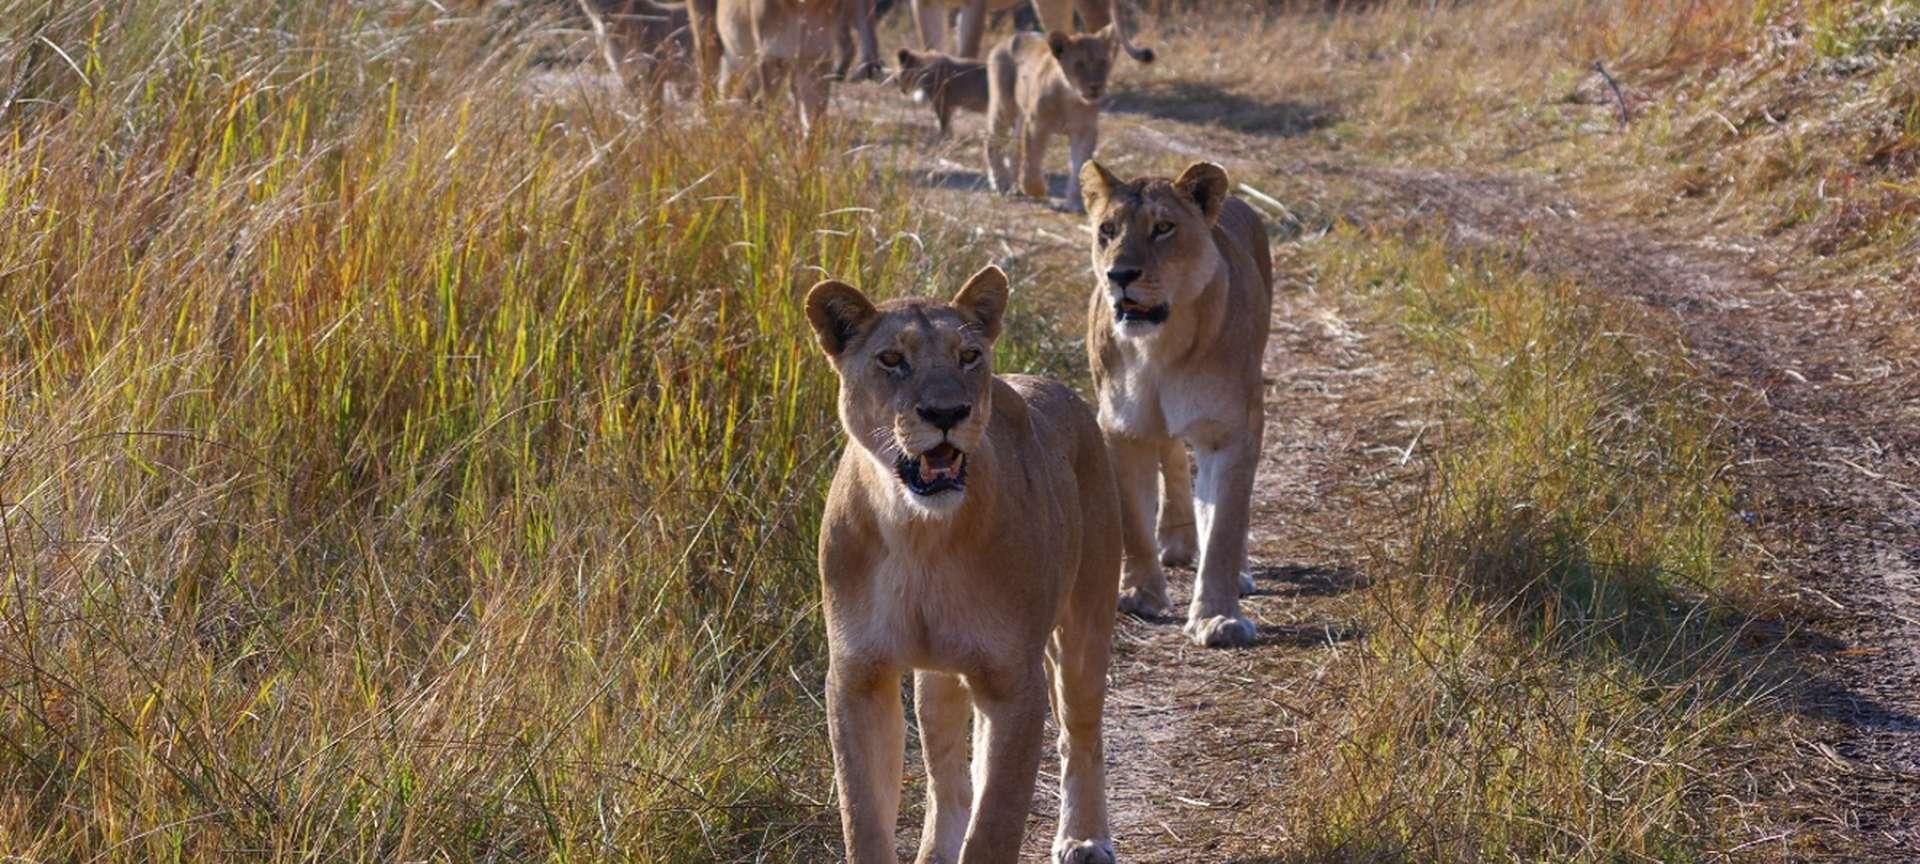 Xakanaxa - Africa Wildlife Safaris